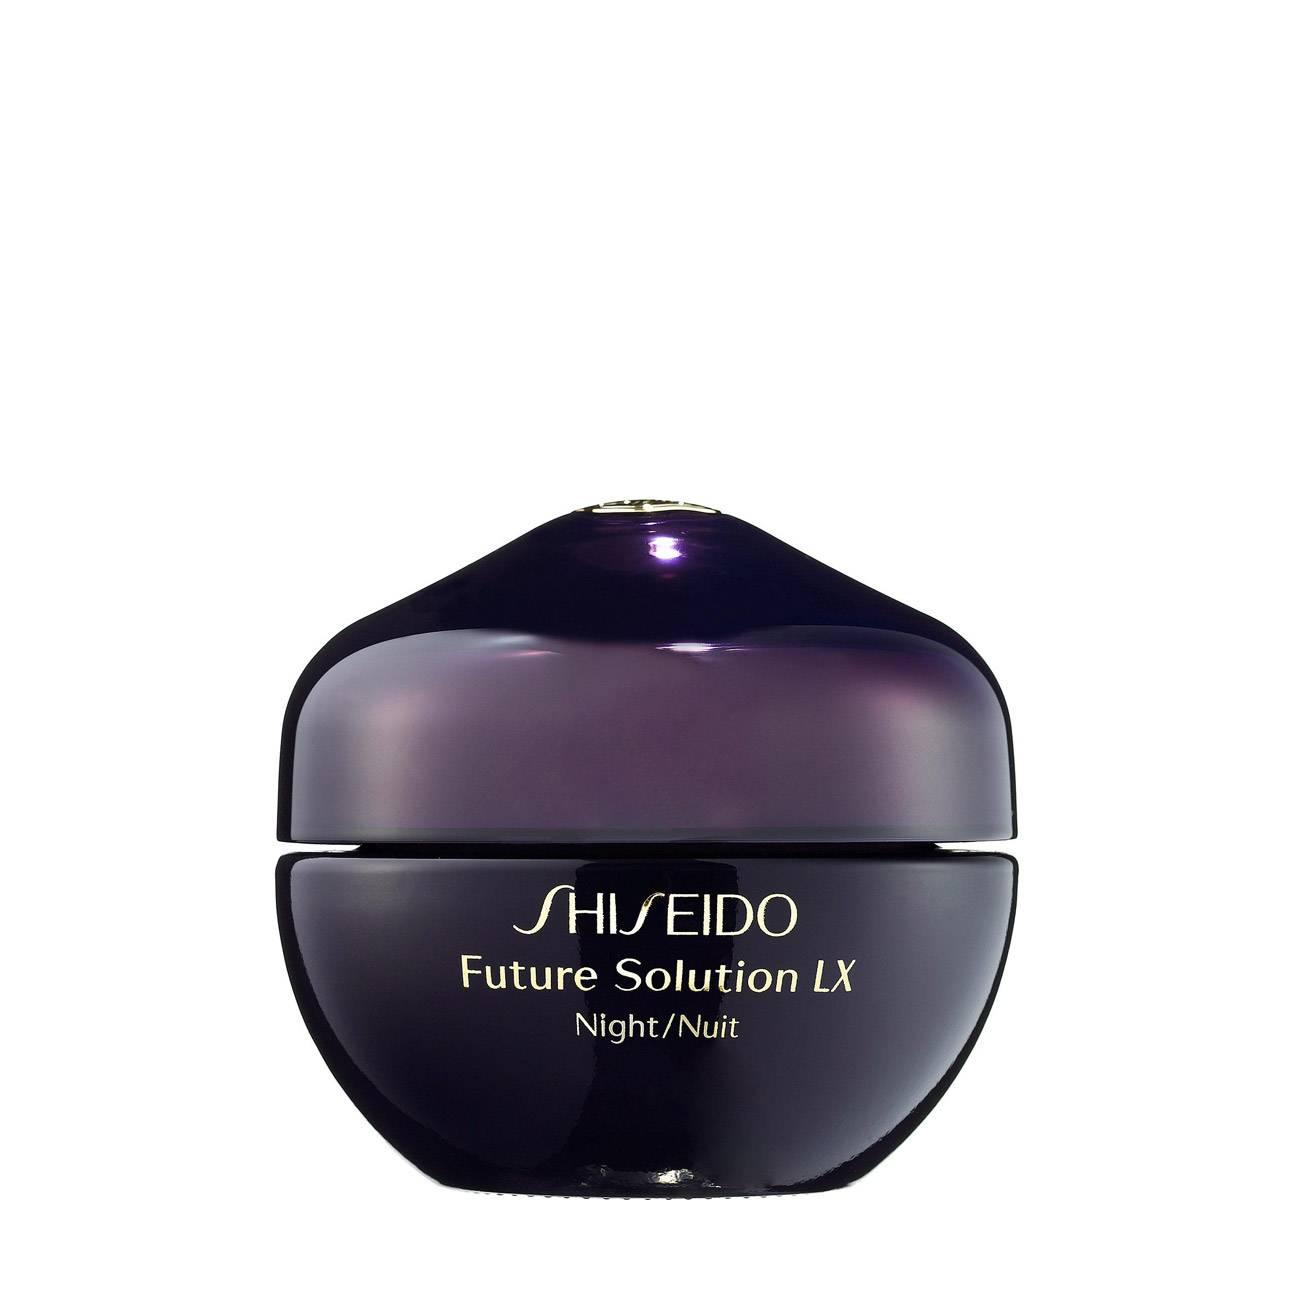 Future Solution Lx Night Cream 50 Ml Shiseido imagine 2021 bestvalue.eu